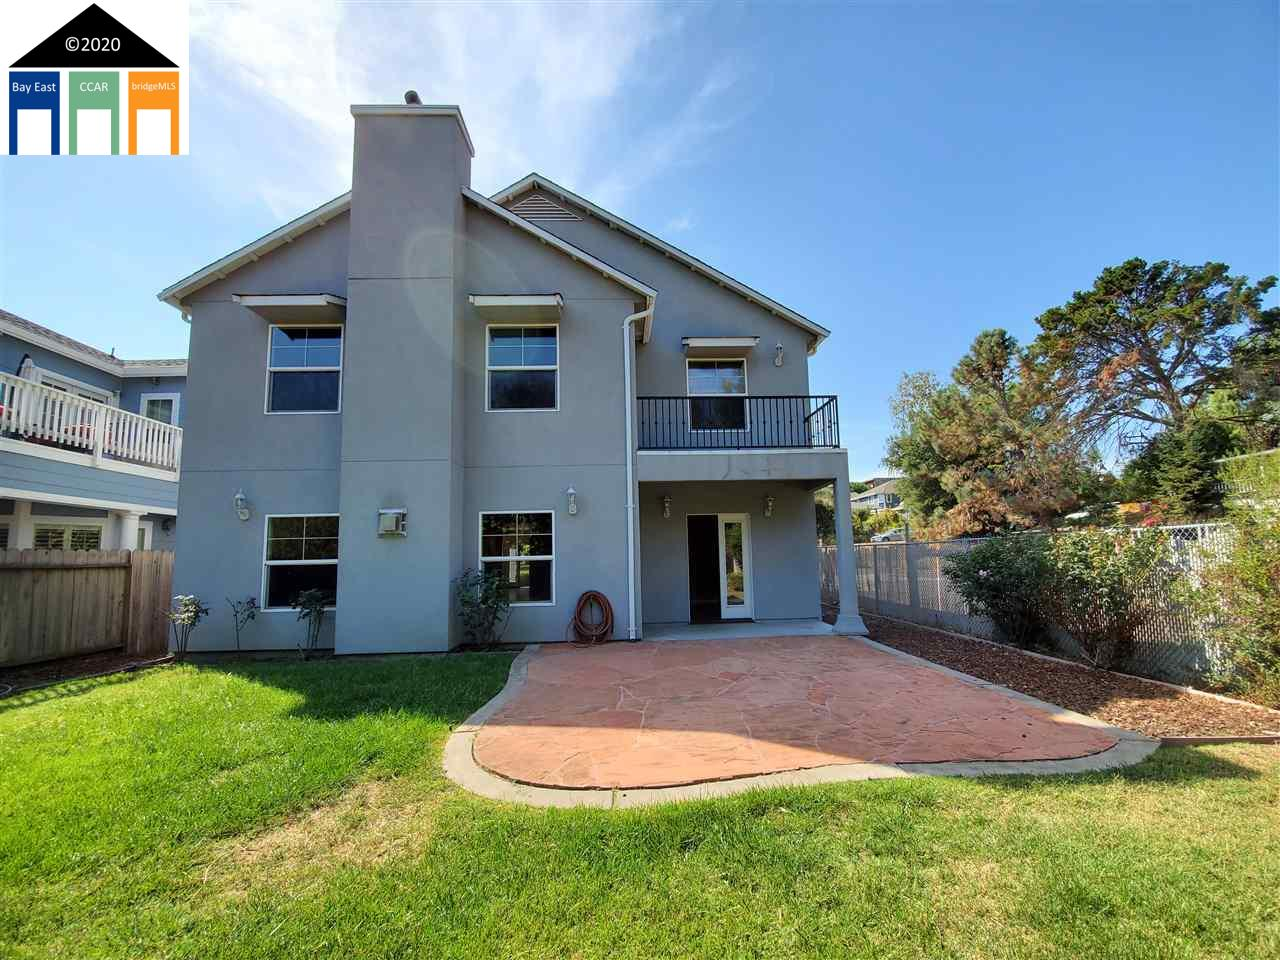 645 J St, Benicia, CA, 94510